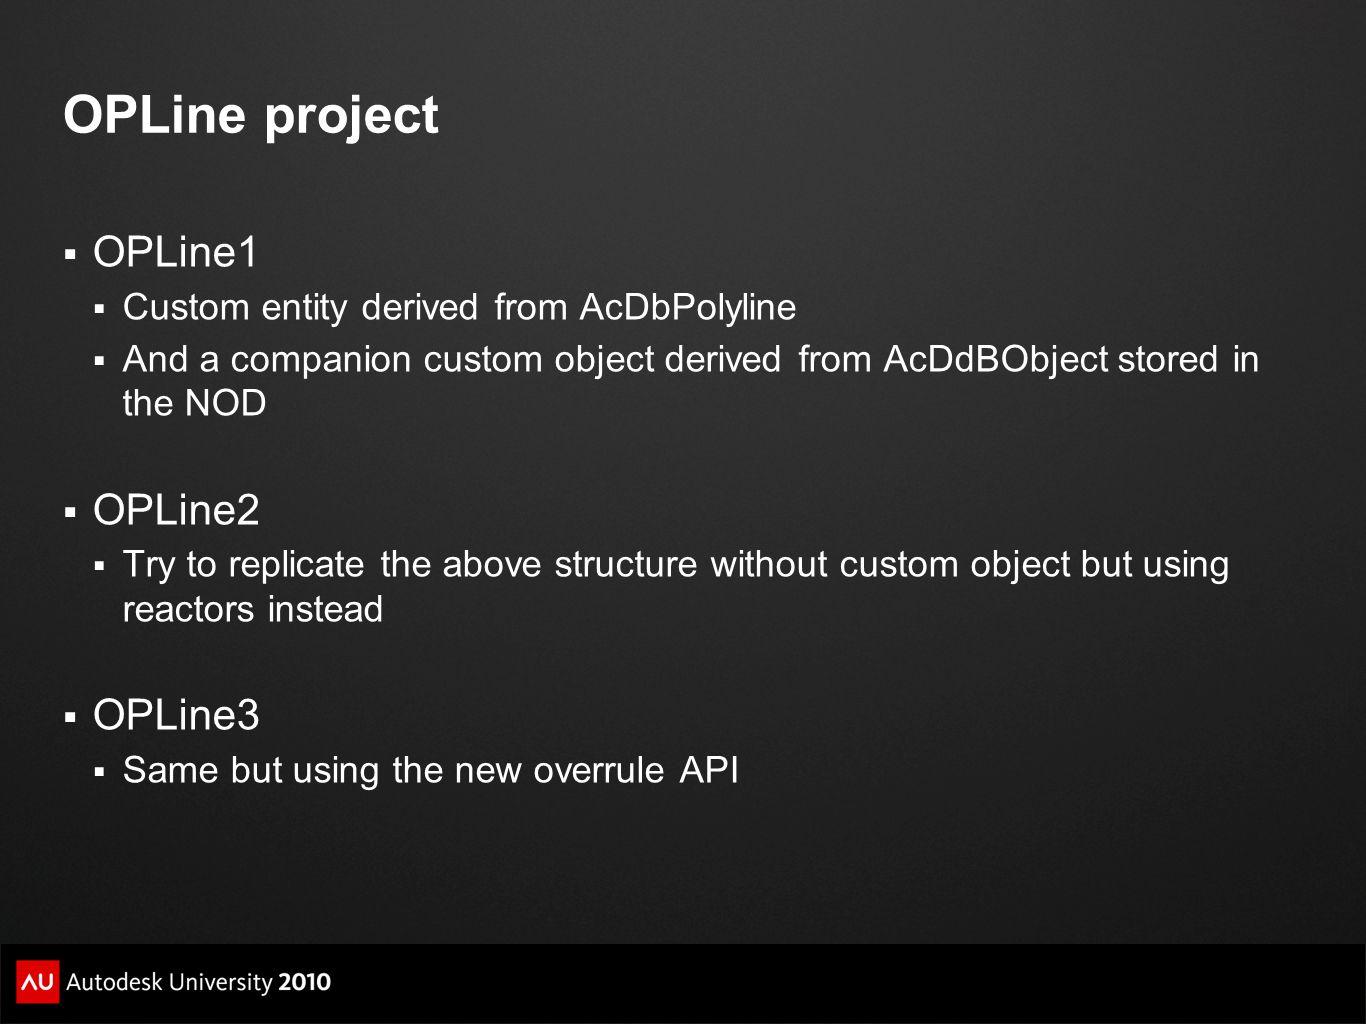 OPLine project  OPLine1  Custom entity derived from AcDbPolyline  And a companion custom object derived from AcDdBObject stored in the NOD  OPLine